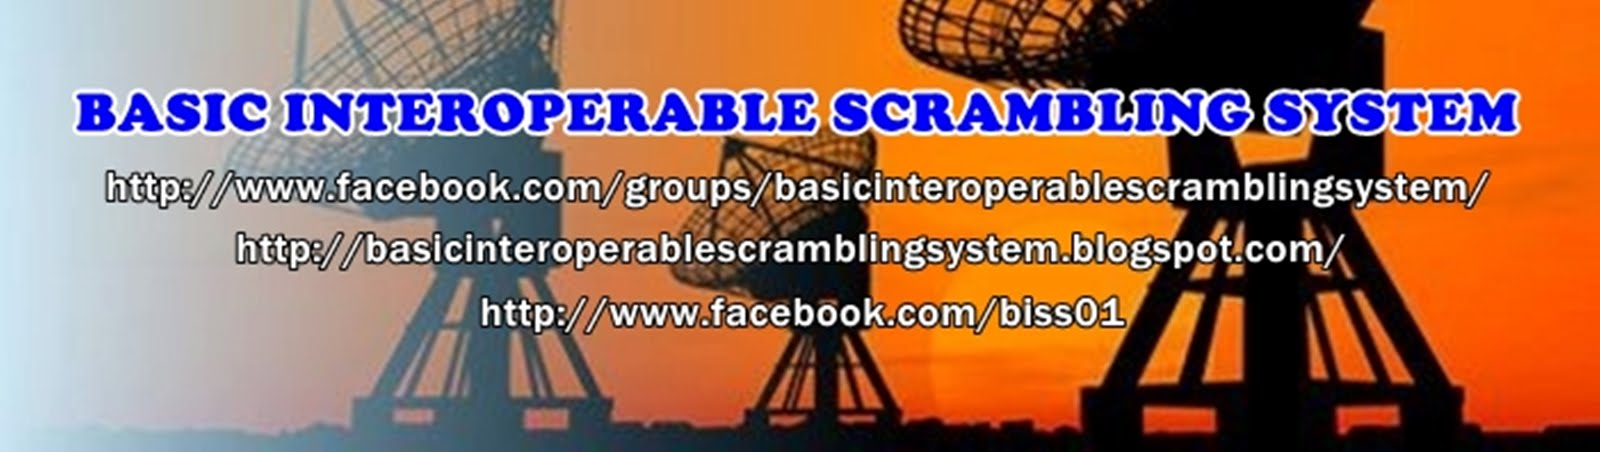 BASIC INTEROPERABLE SCRAMBLING SYSTEM: jarak INTELSAT 19